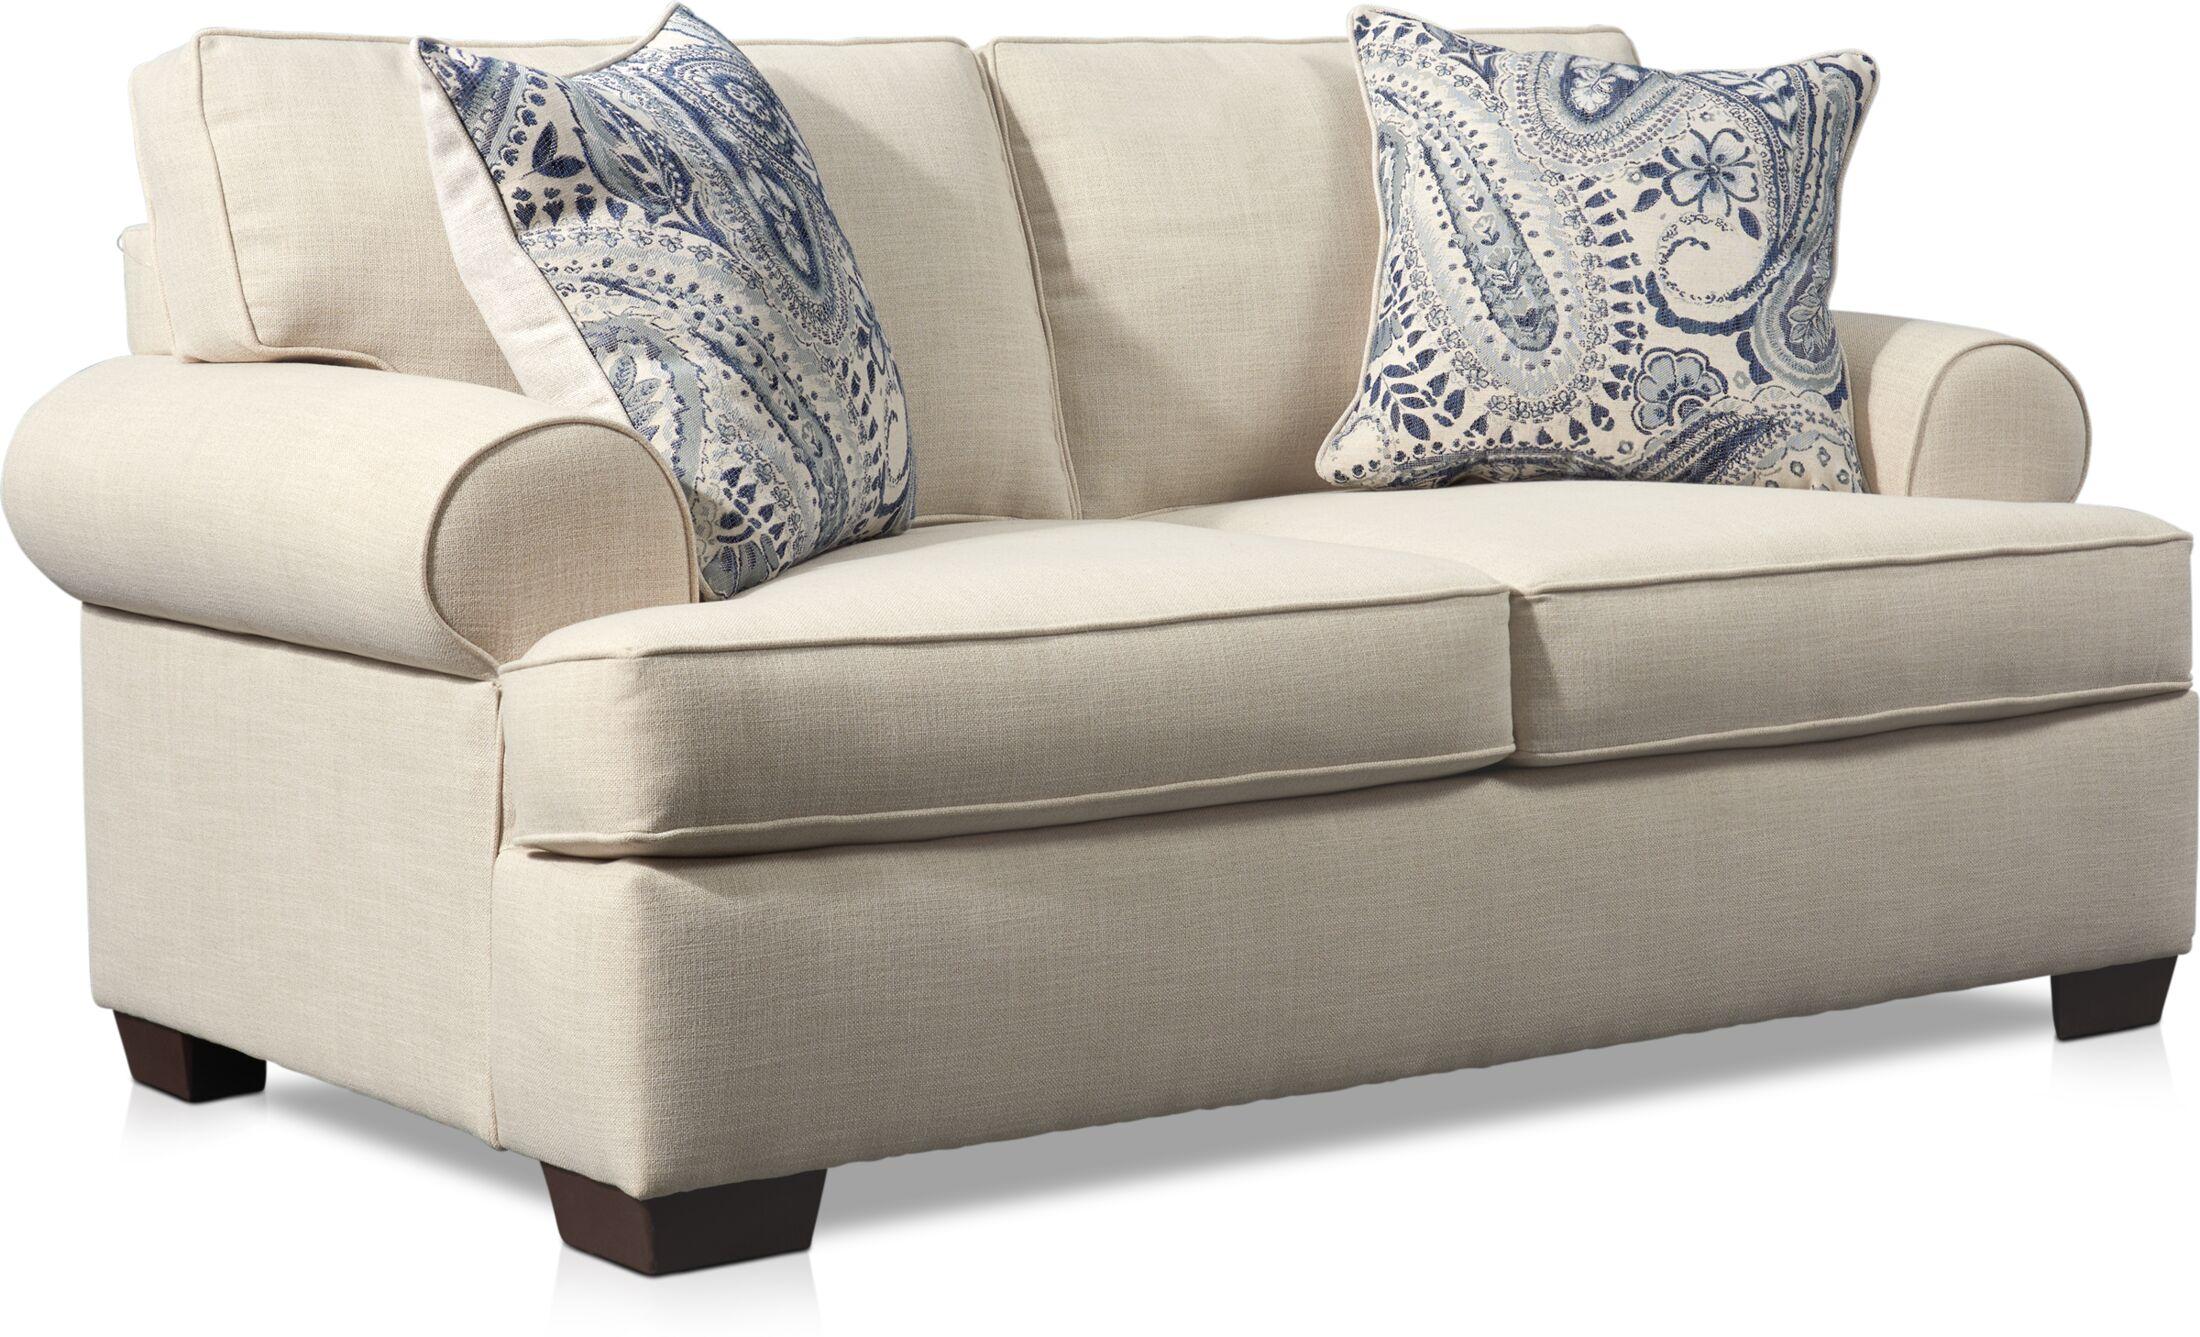 Living Room Furniture - Riley Loveseat